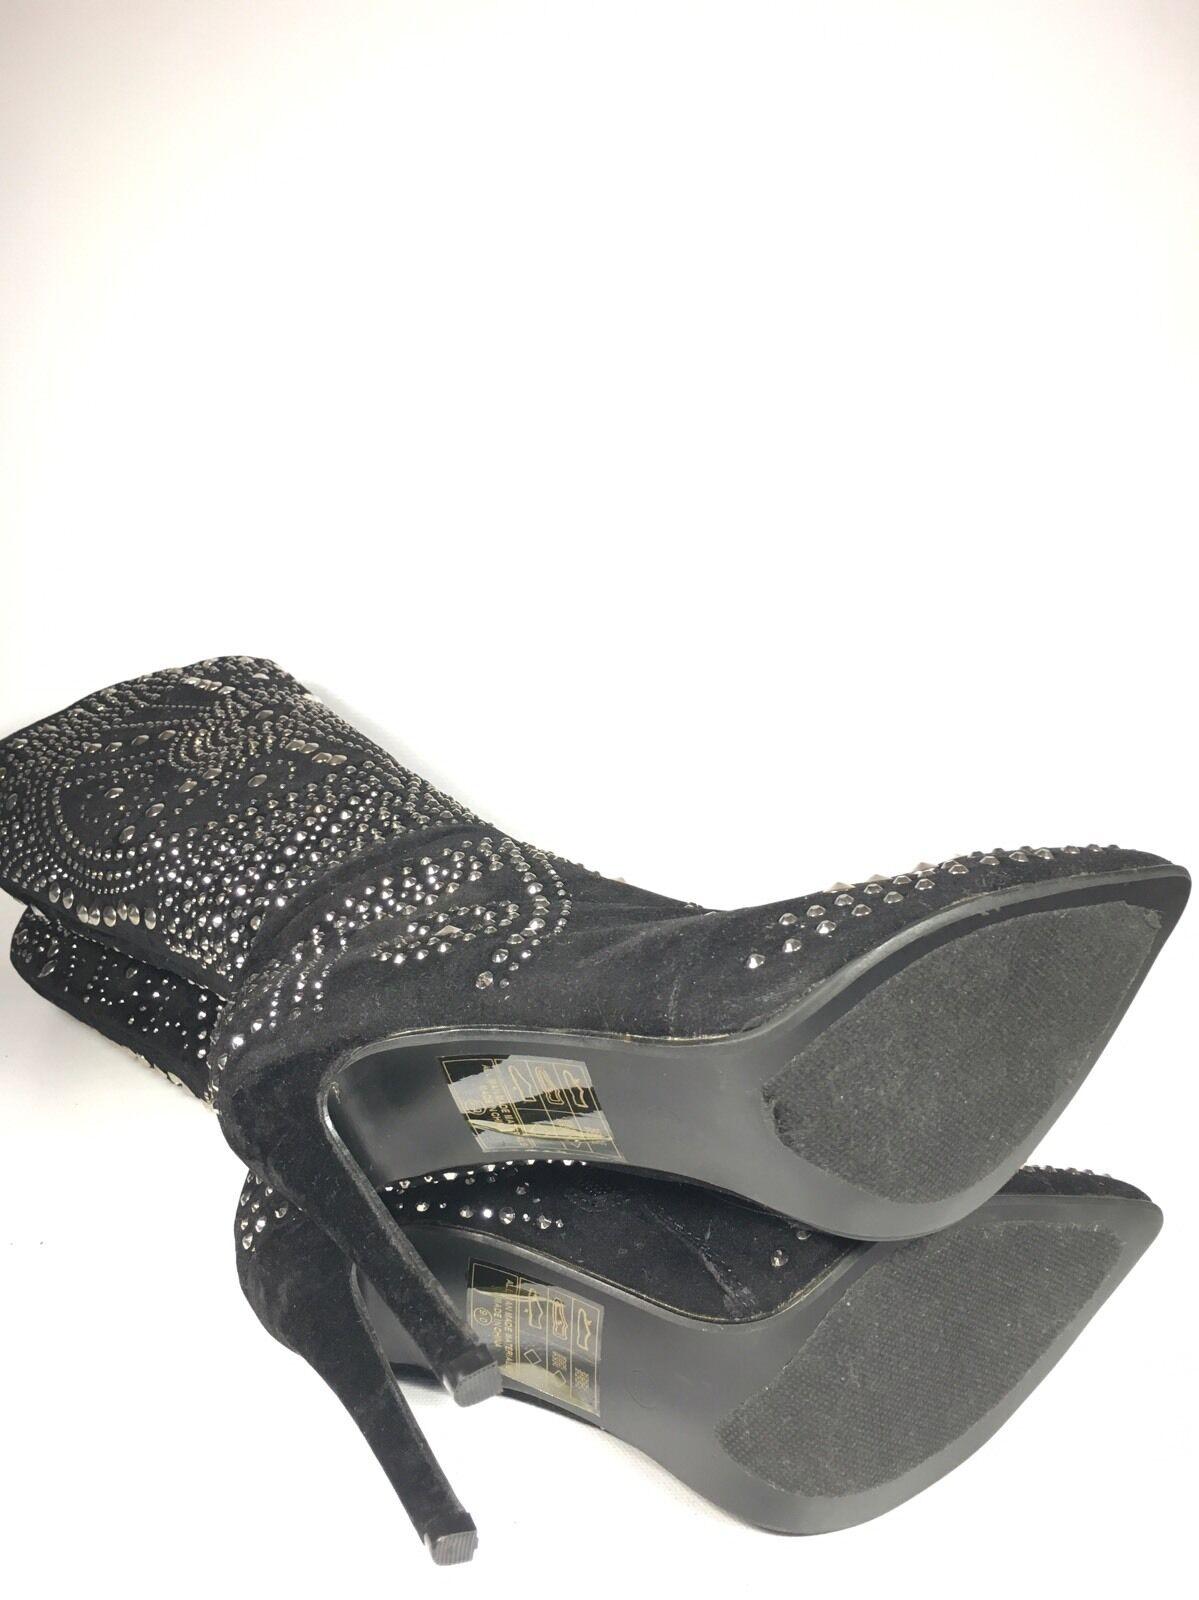 ShuSole ShuSole ShuSole Women's 39 EU Black Suede Studded Point Toe Stiletto Boots d3b019